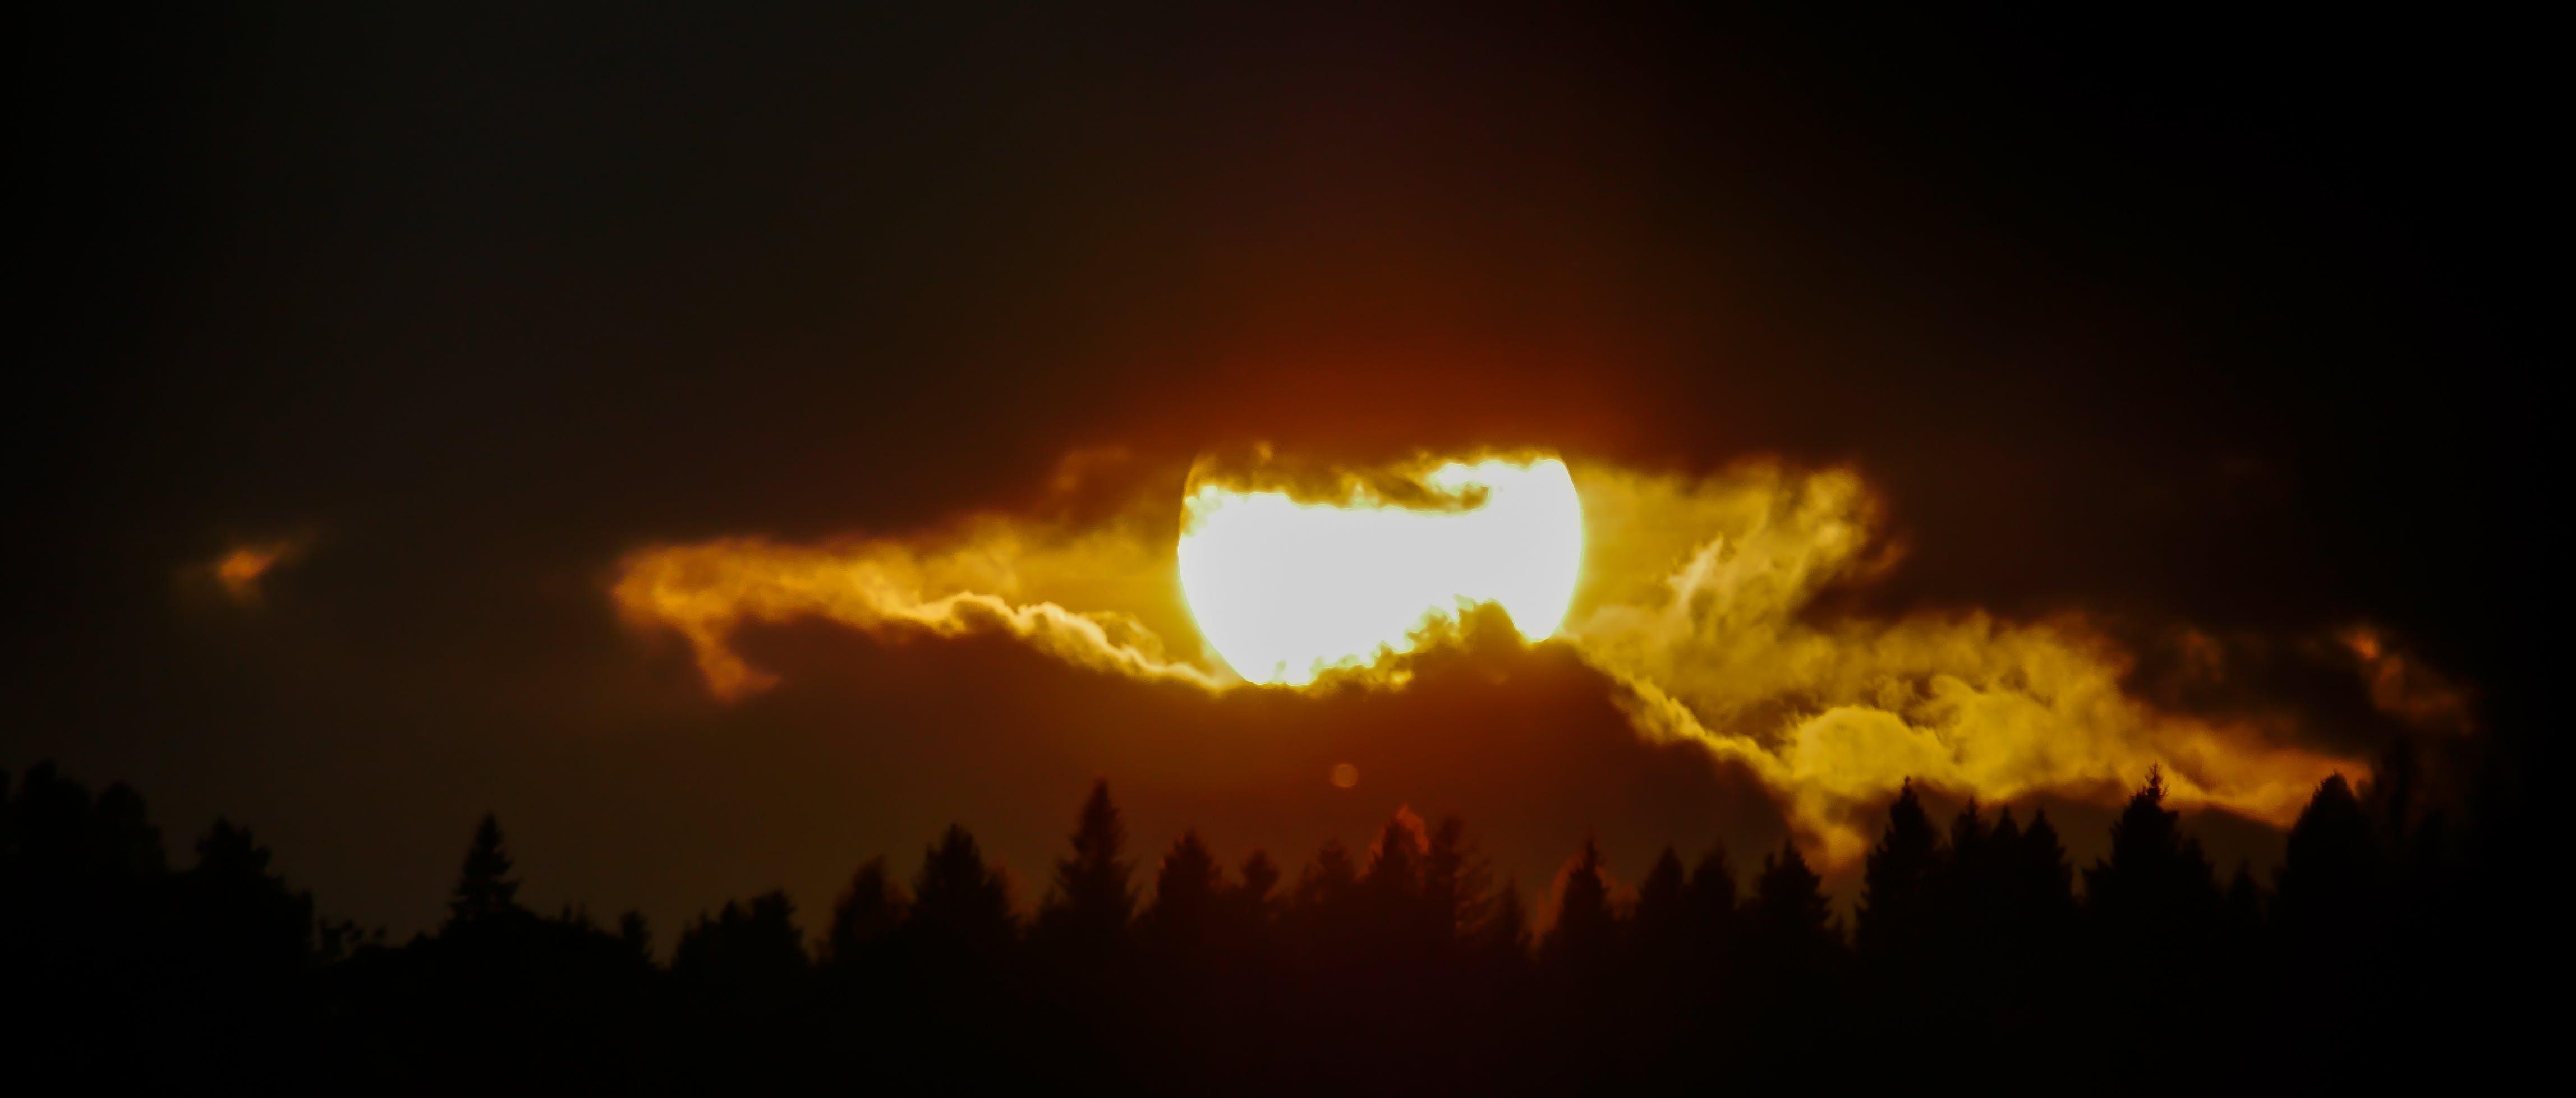 Free stock photo of sunset, holiday, romantic, sun